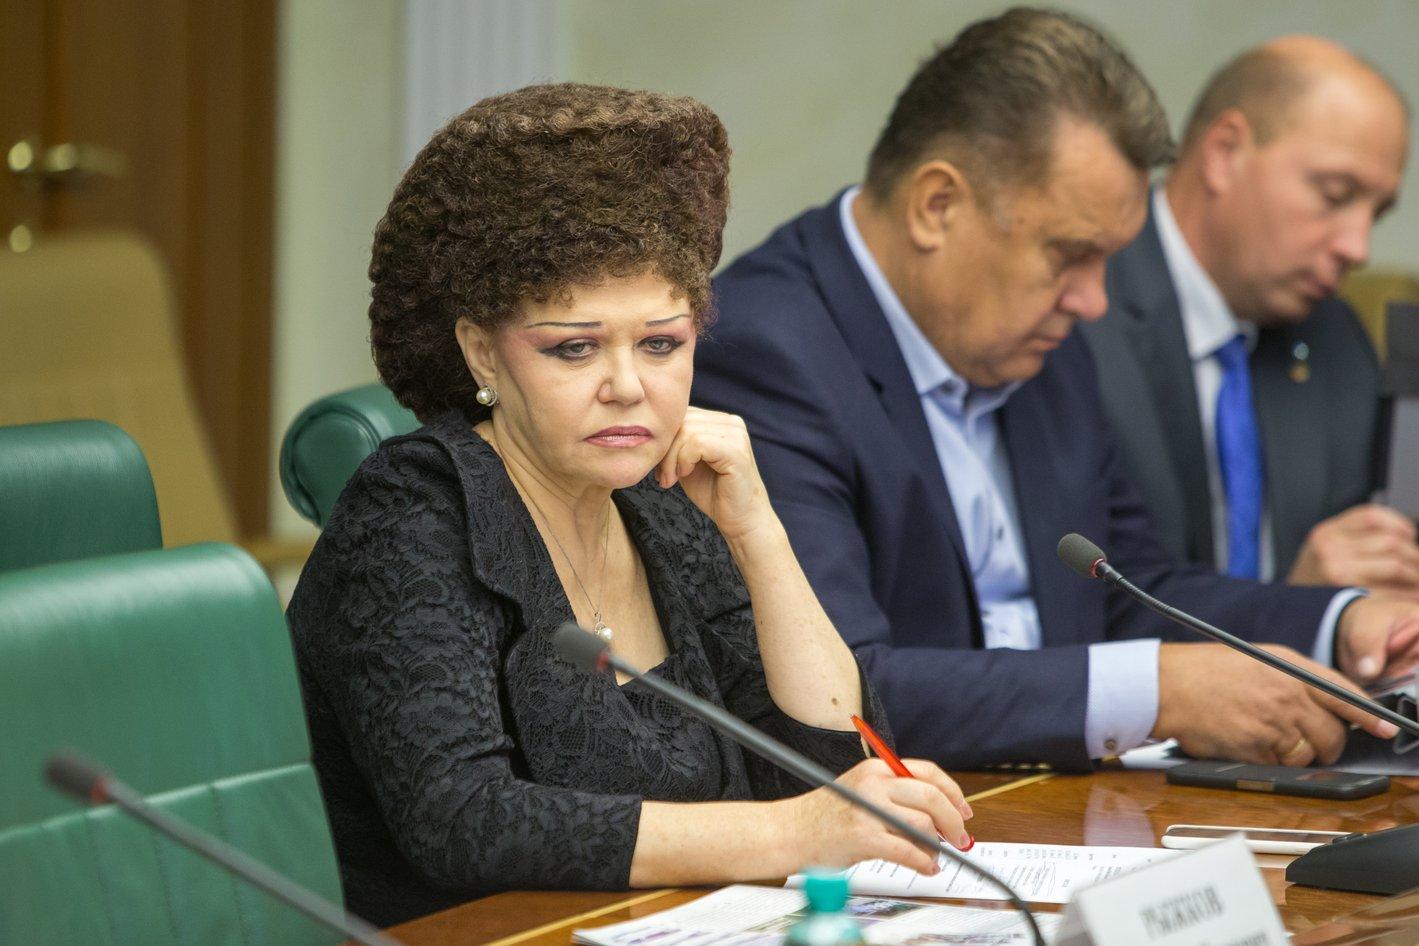 petrenko-chlen-soveta-federatsii